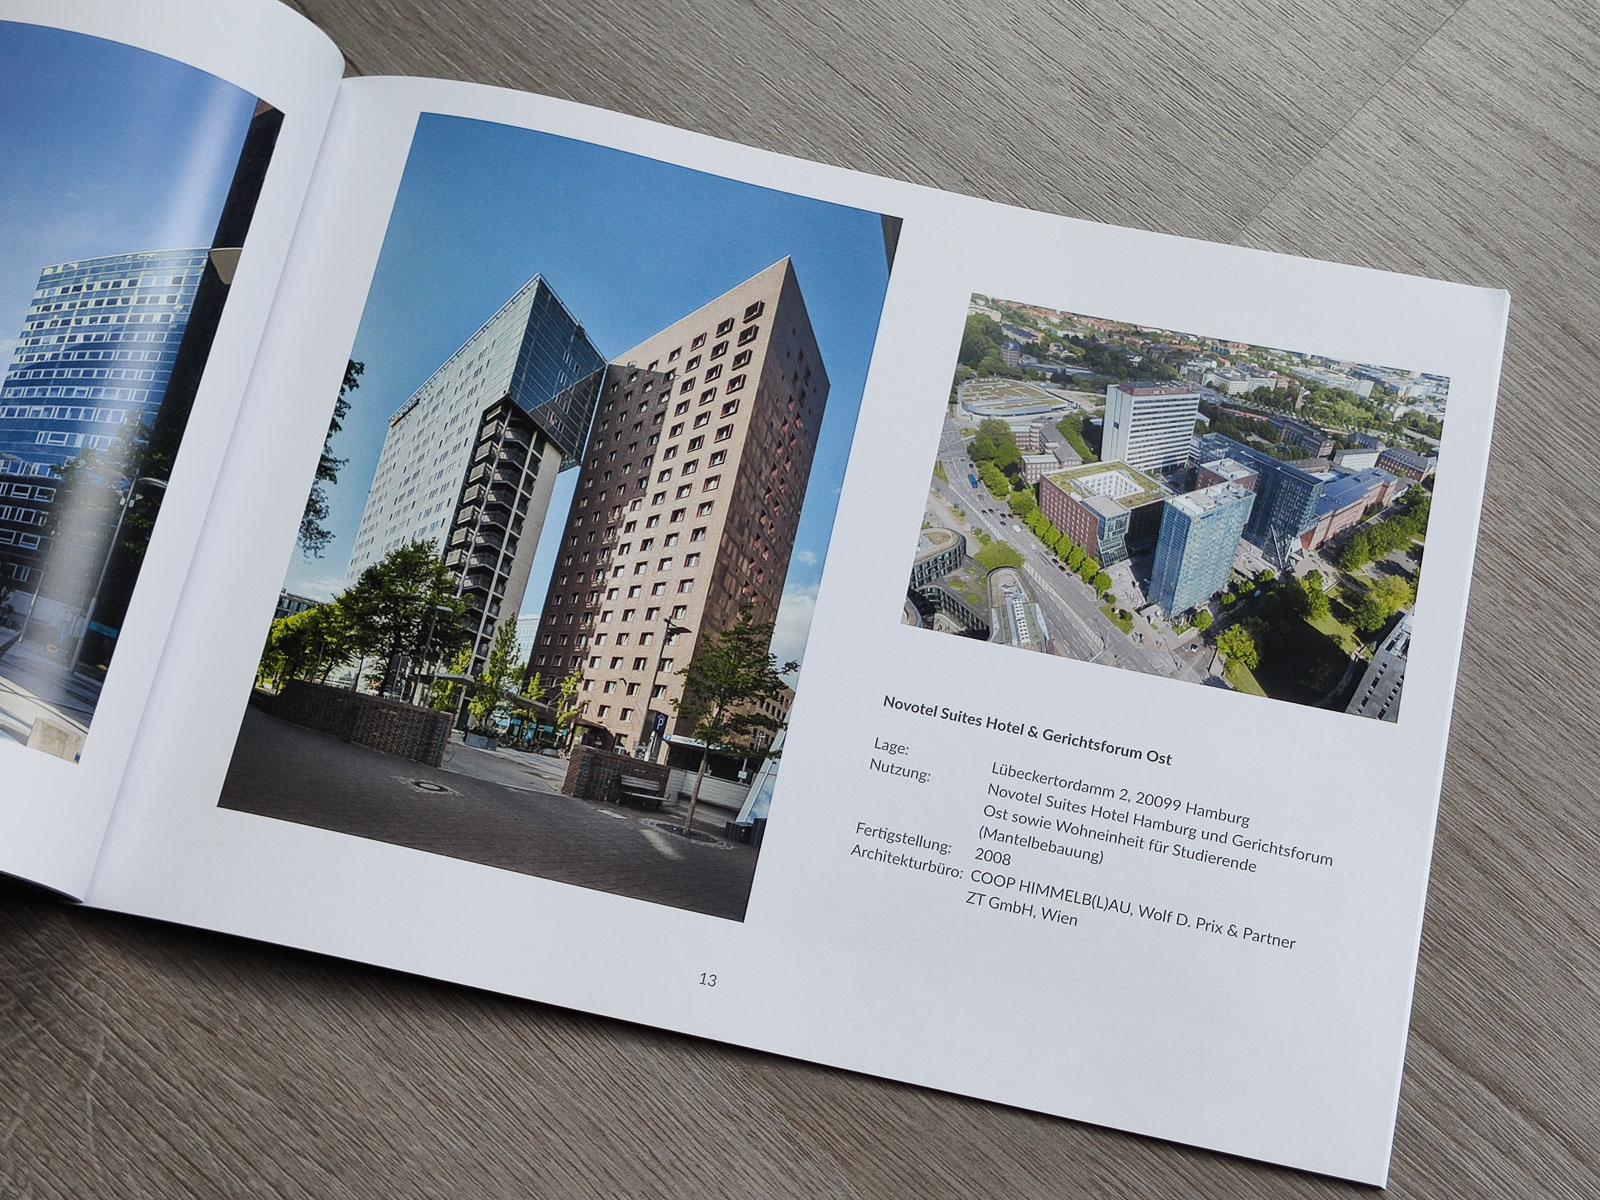 Novotel Suites Simens Hamburg